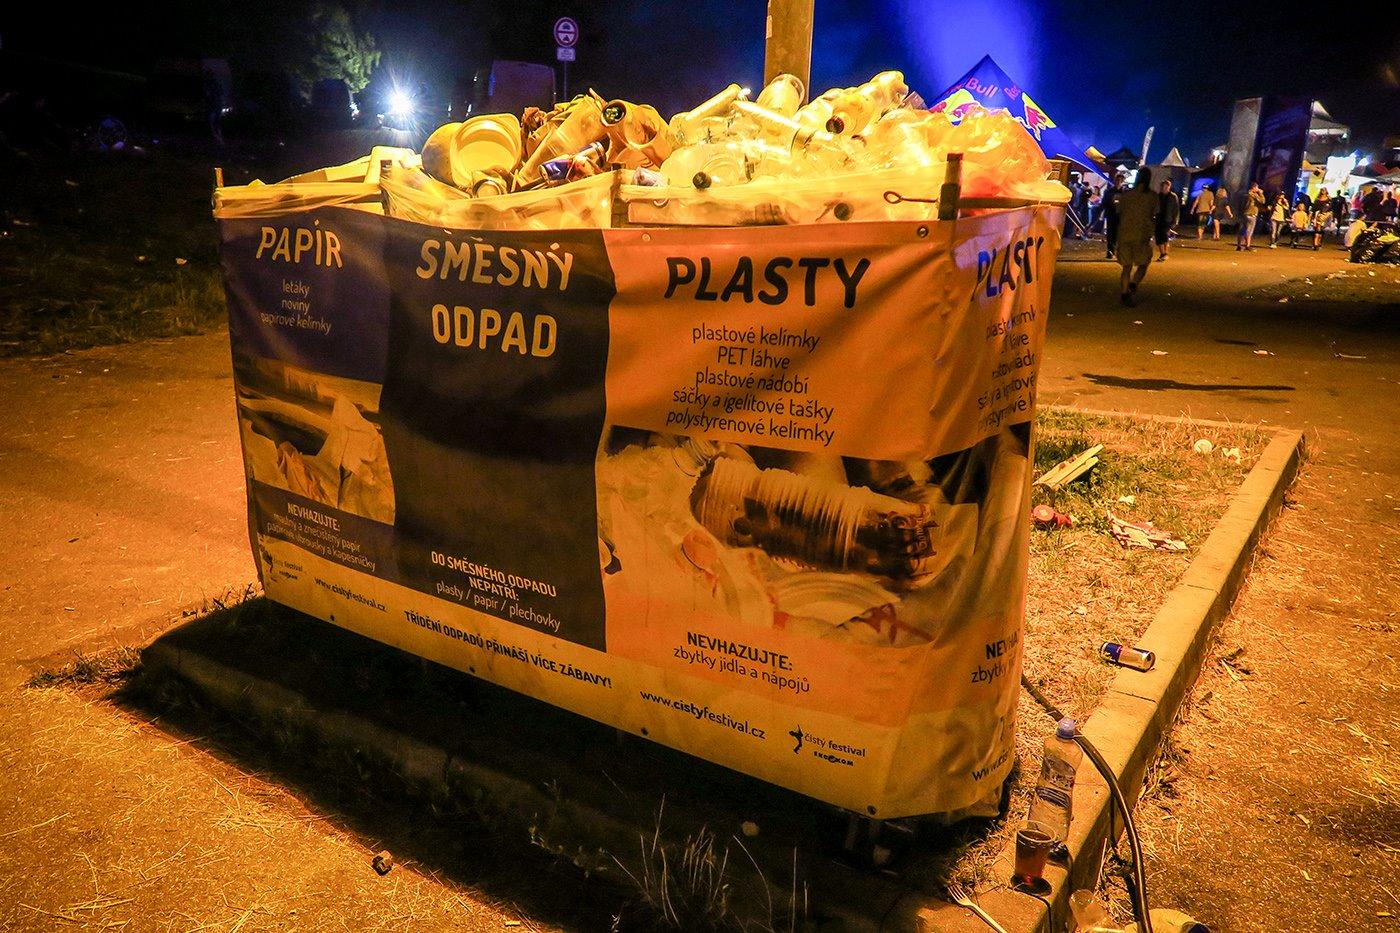 trideni_odpadu_ciste_festivaly_papir_smesny_odpad_plast